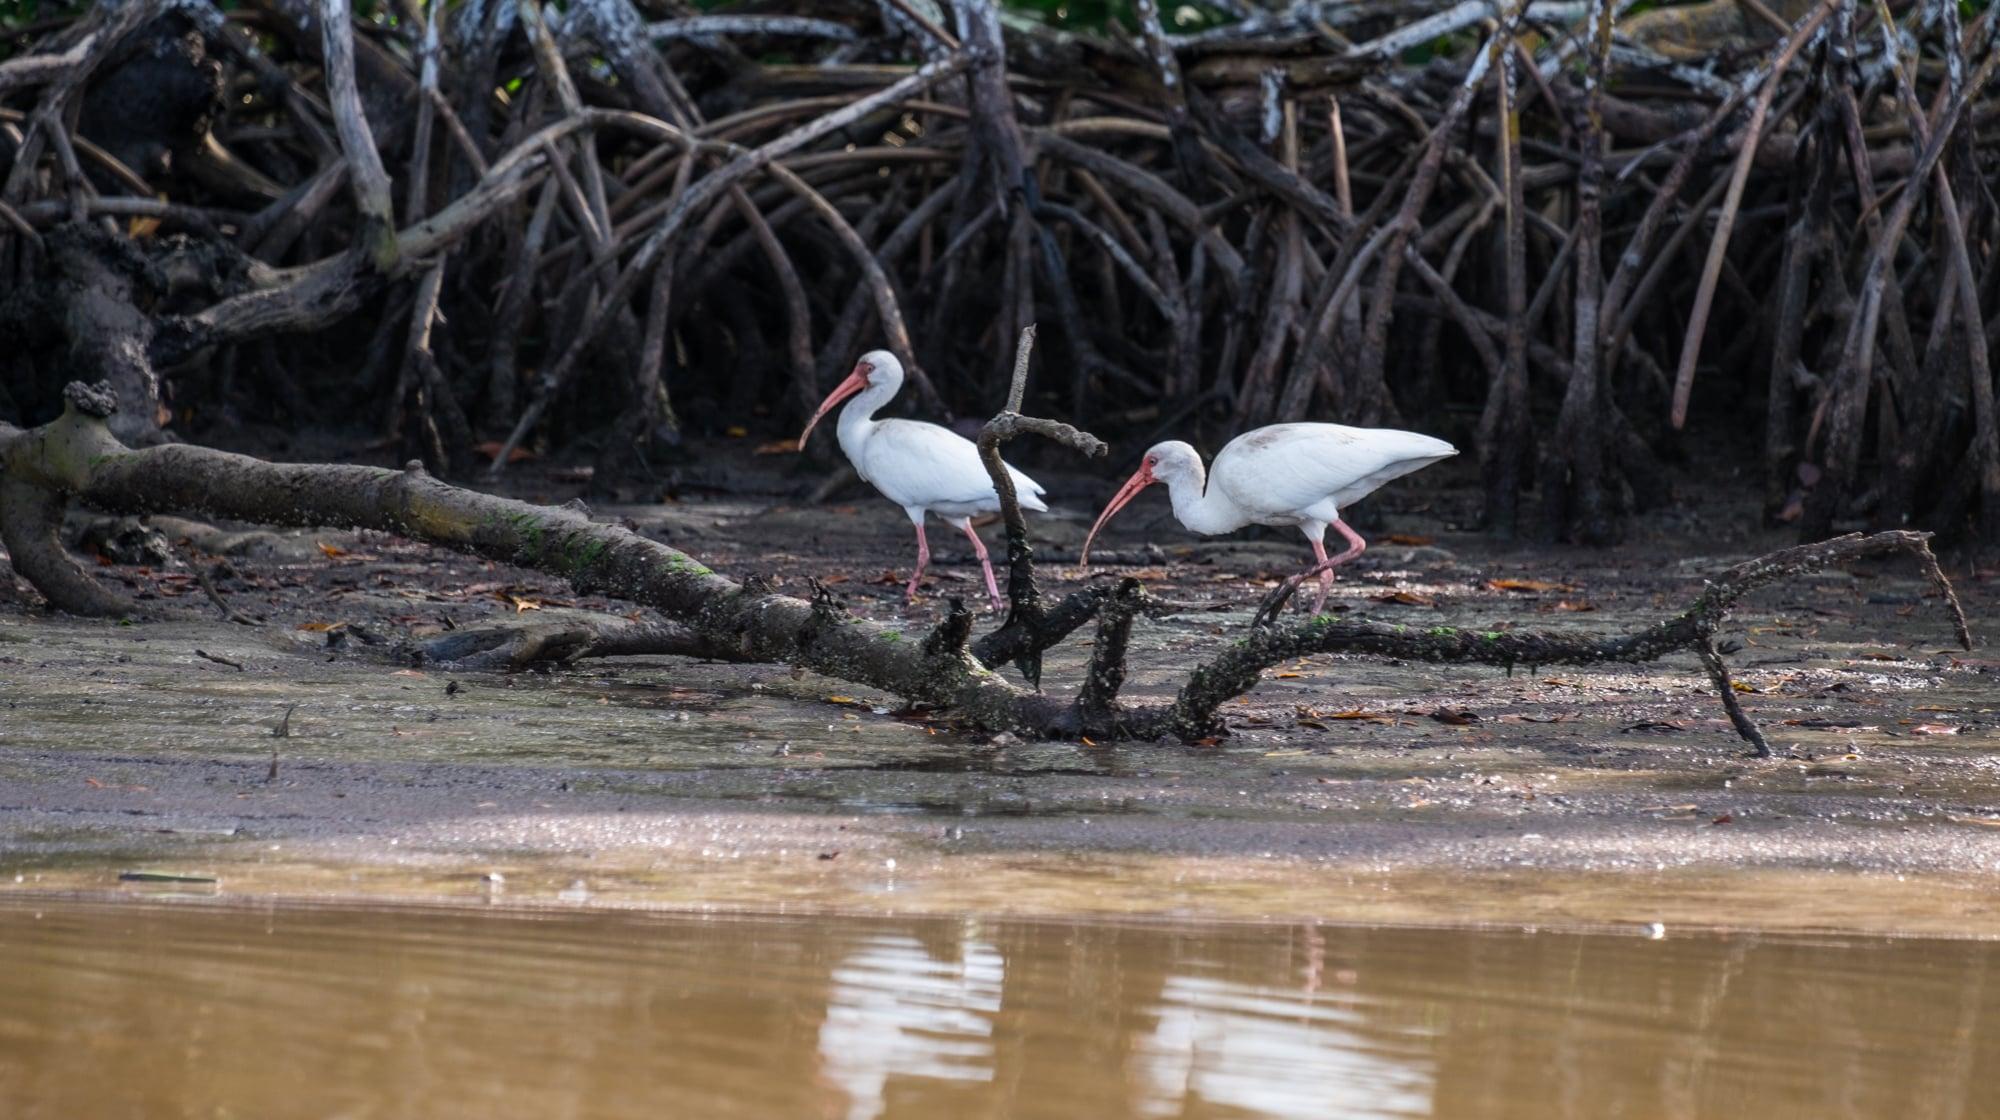 Birds among the mangroves.